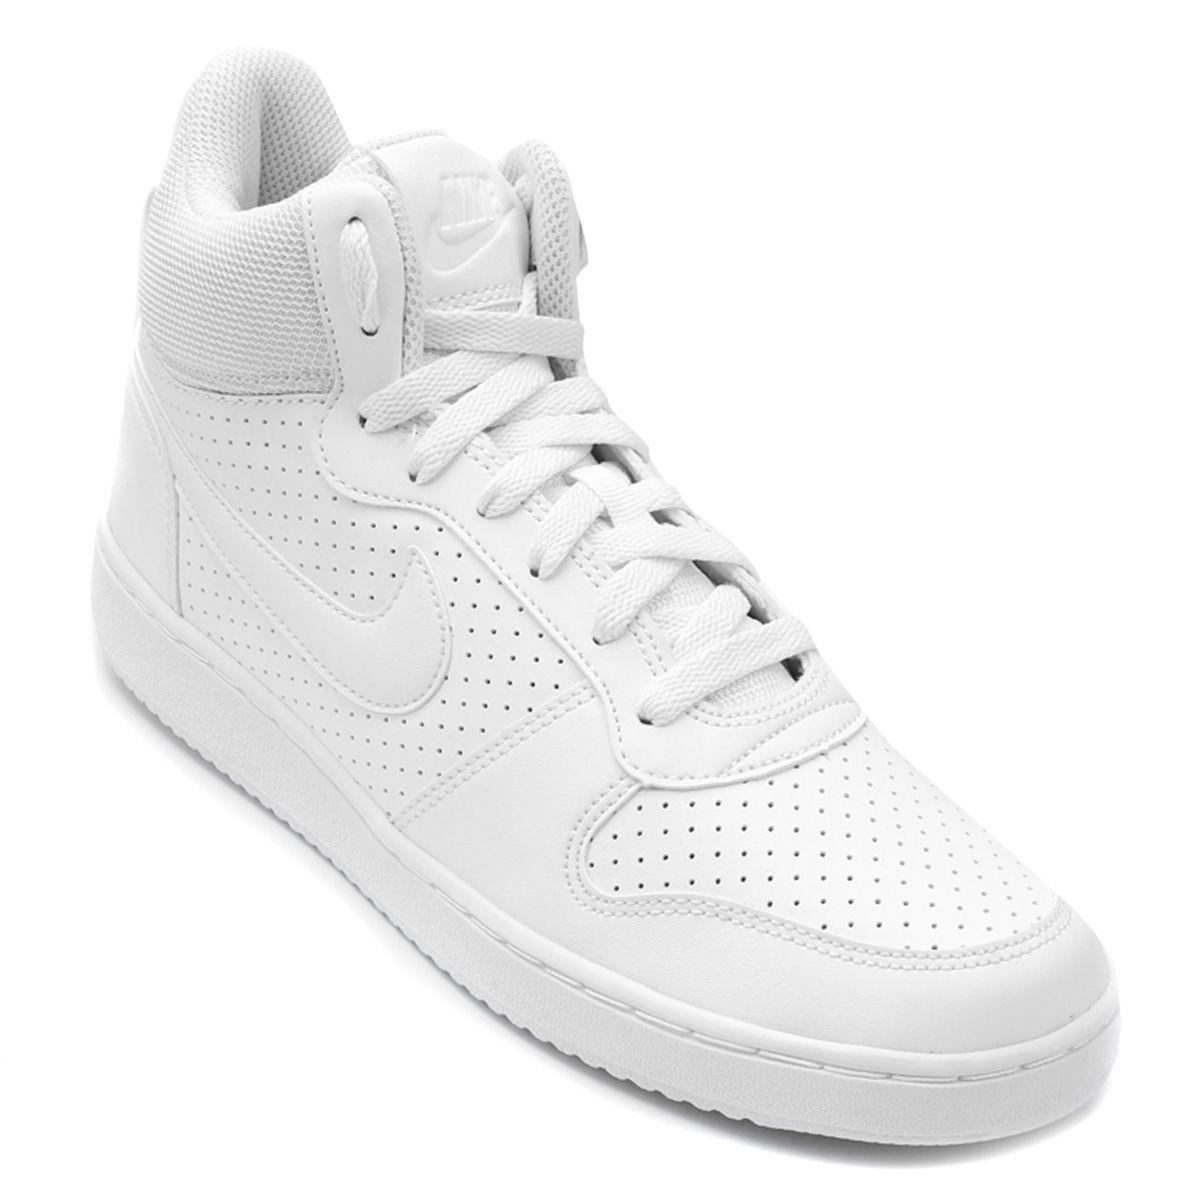 7aace76104 Tênis Couro Cano Alto Nike Recreation Mid Masculino - Compre Agora ...